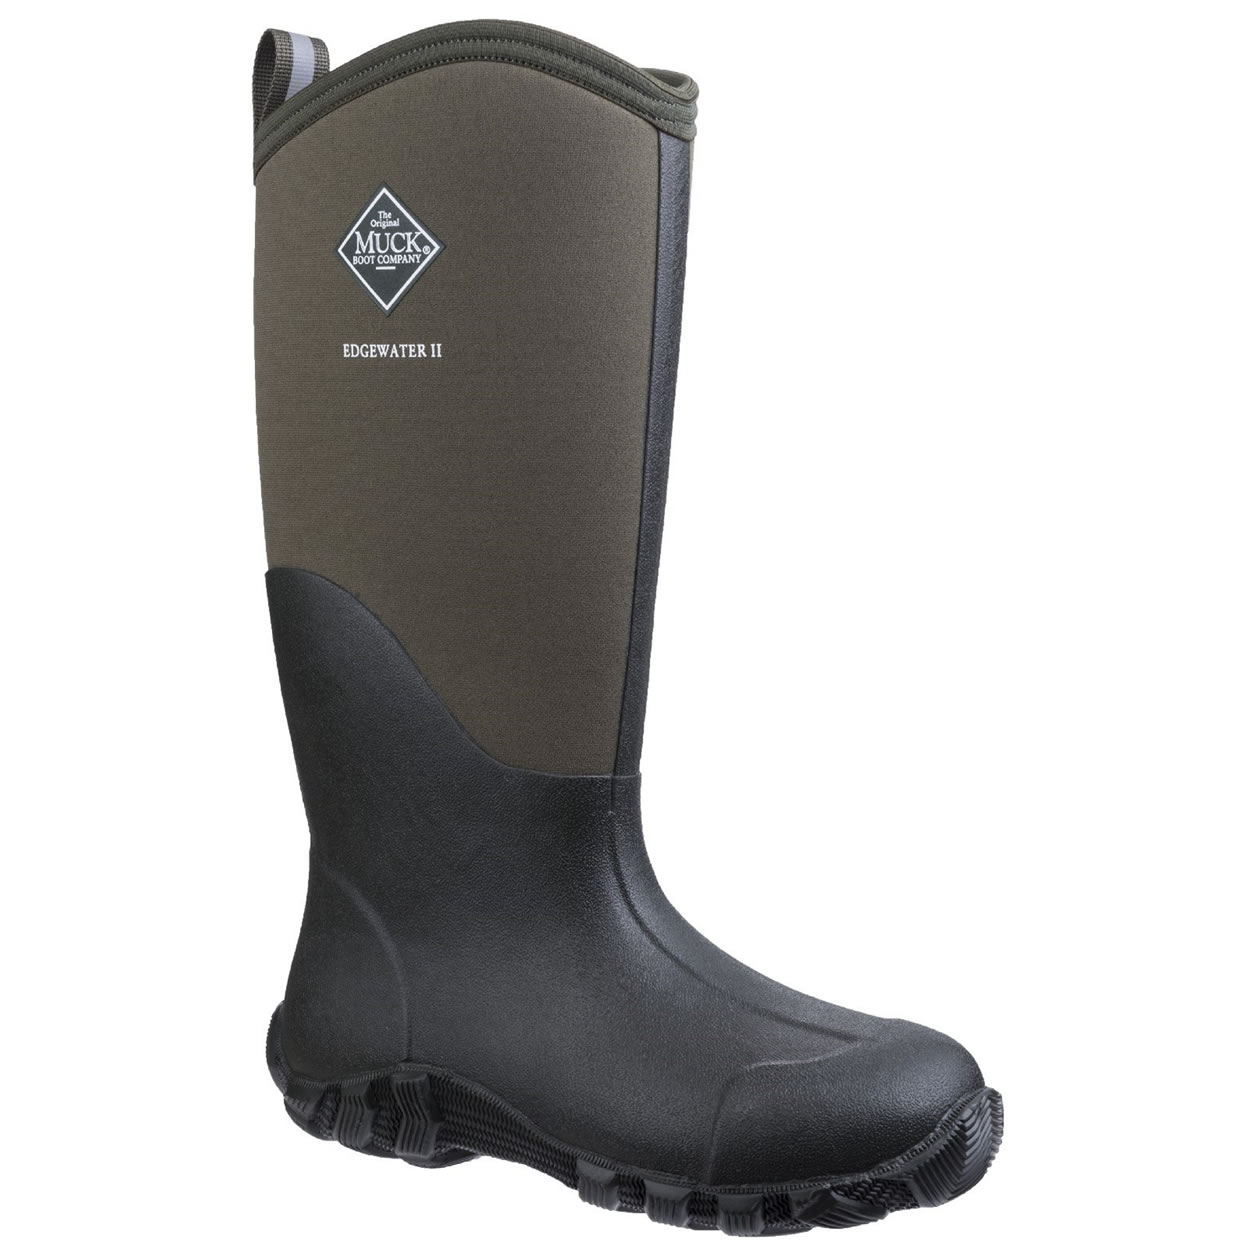 071ff10ddea Muck Boot - Edgewater II - Moss - UK9